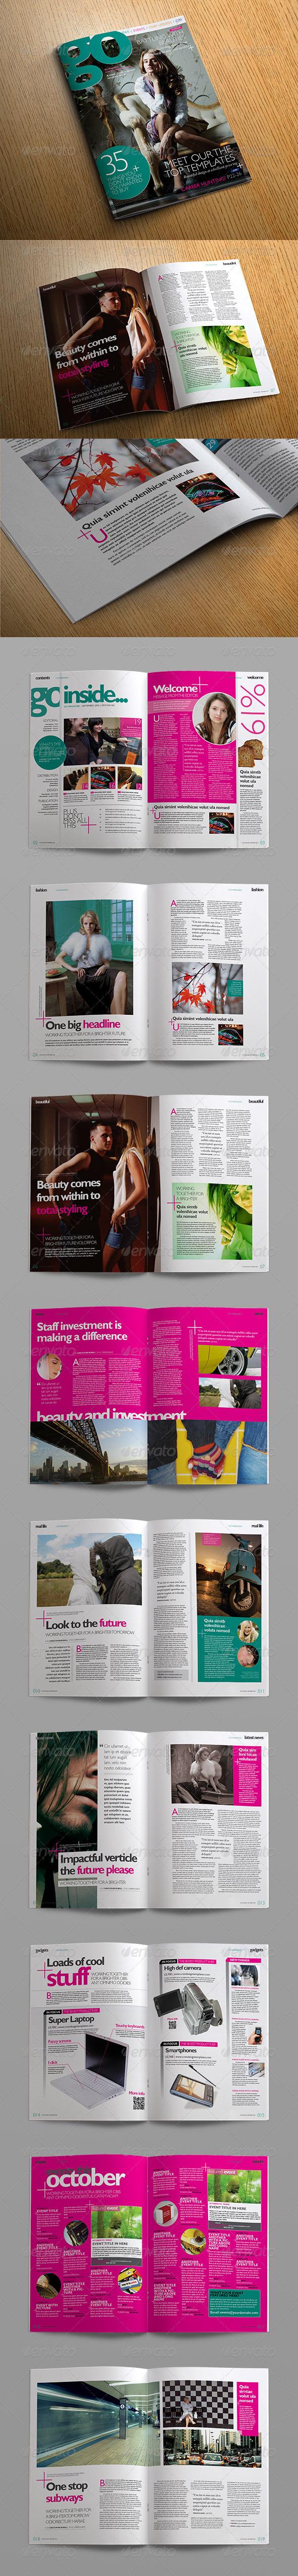 Go Creativity Magazine - Magazines Print Templates